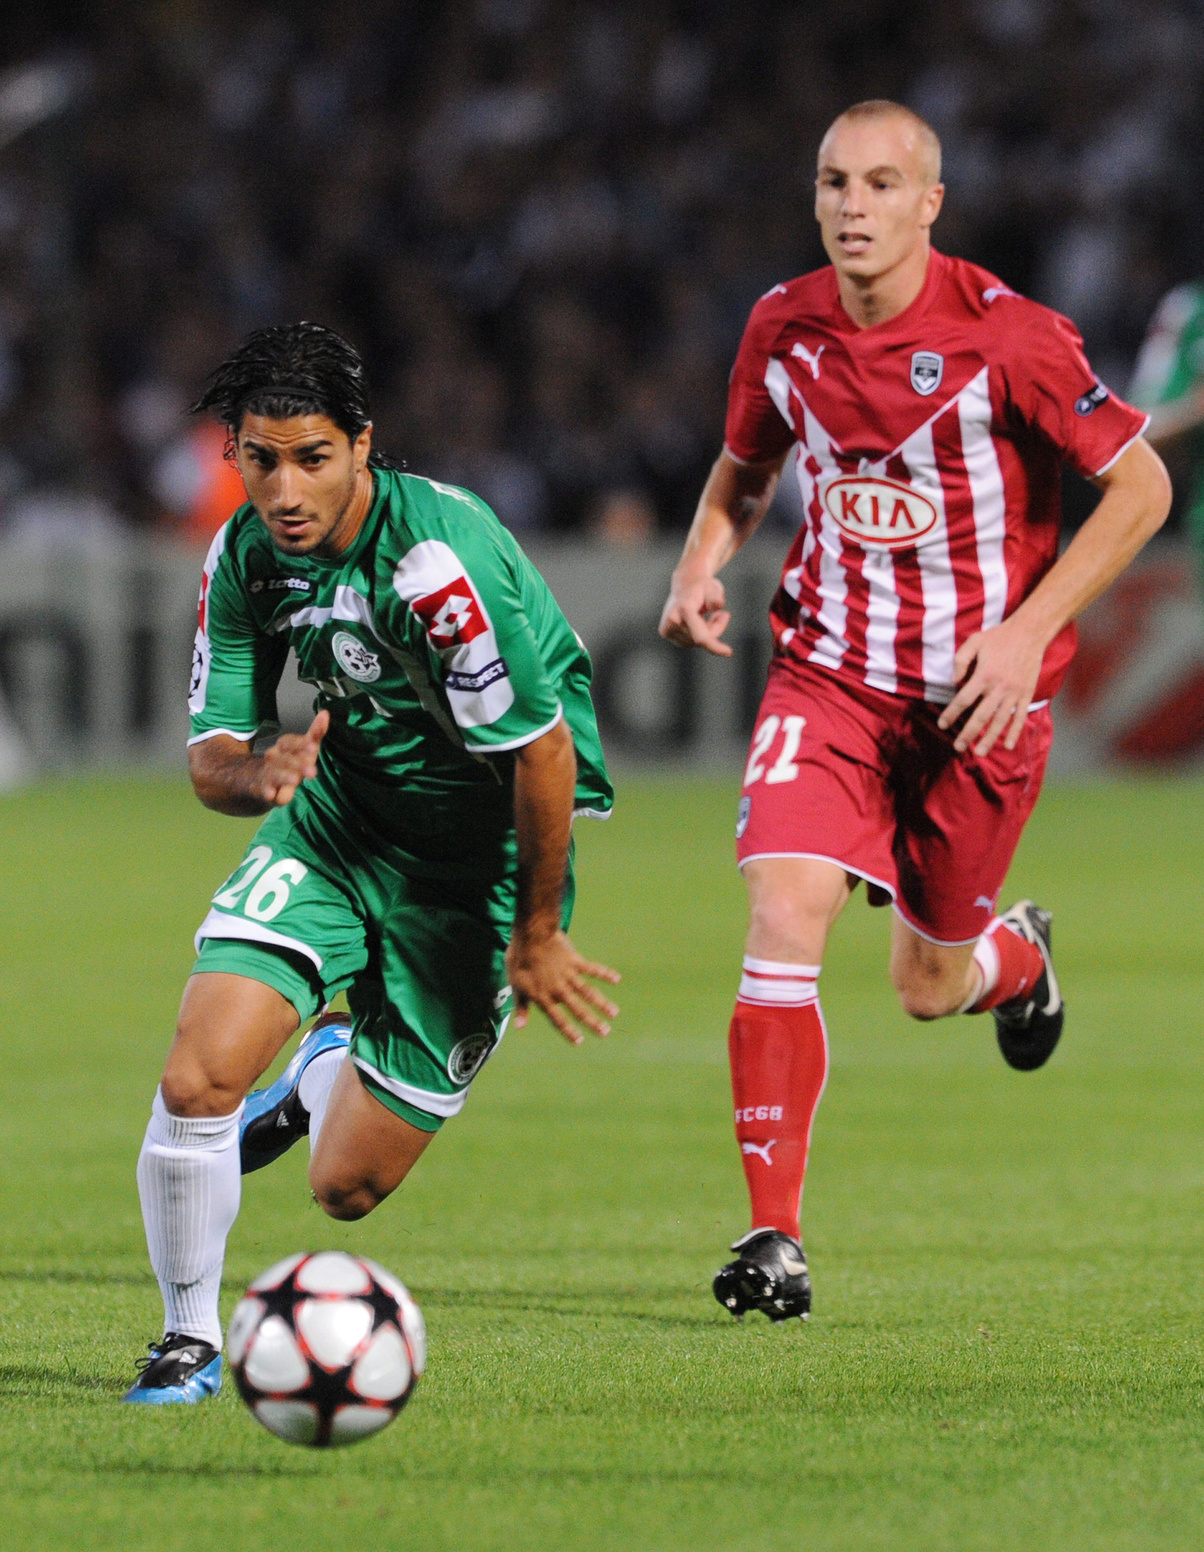 Refaelov bij Maccabi Haifa, Belga Image